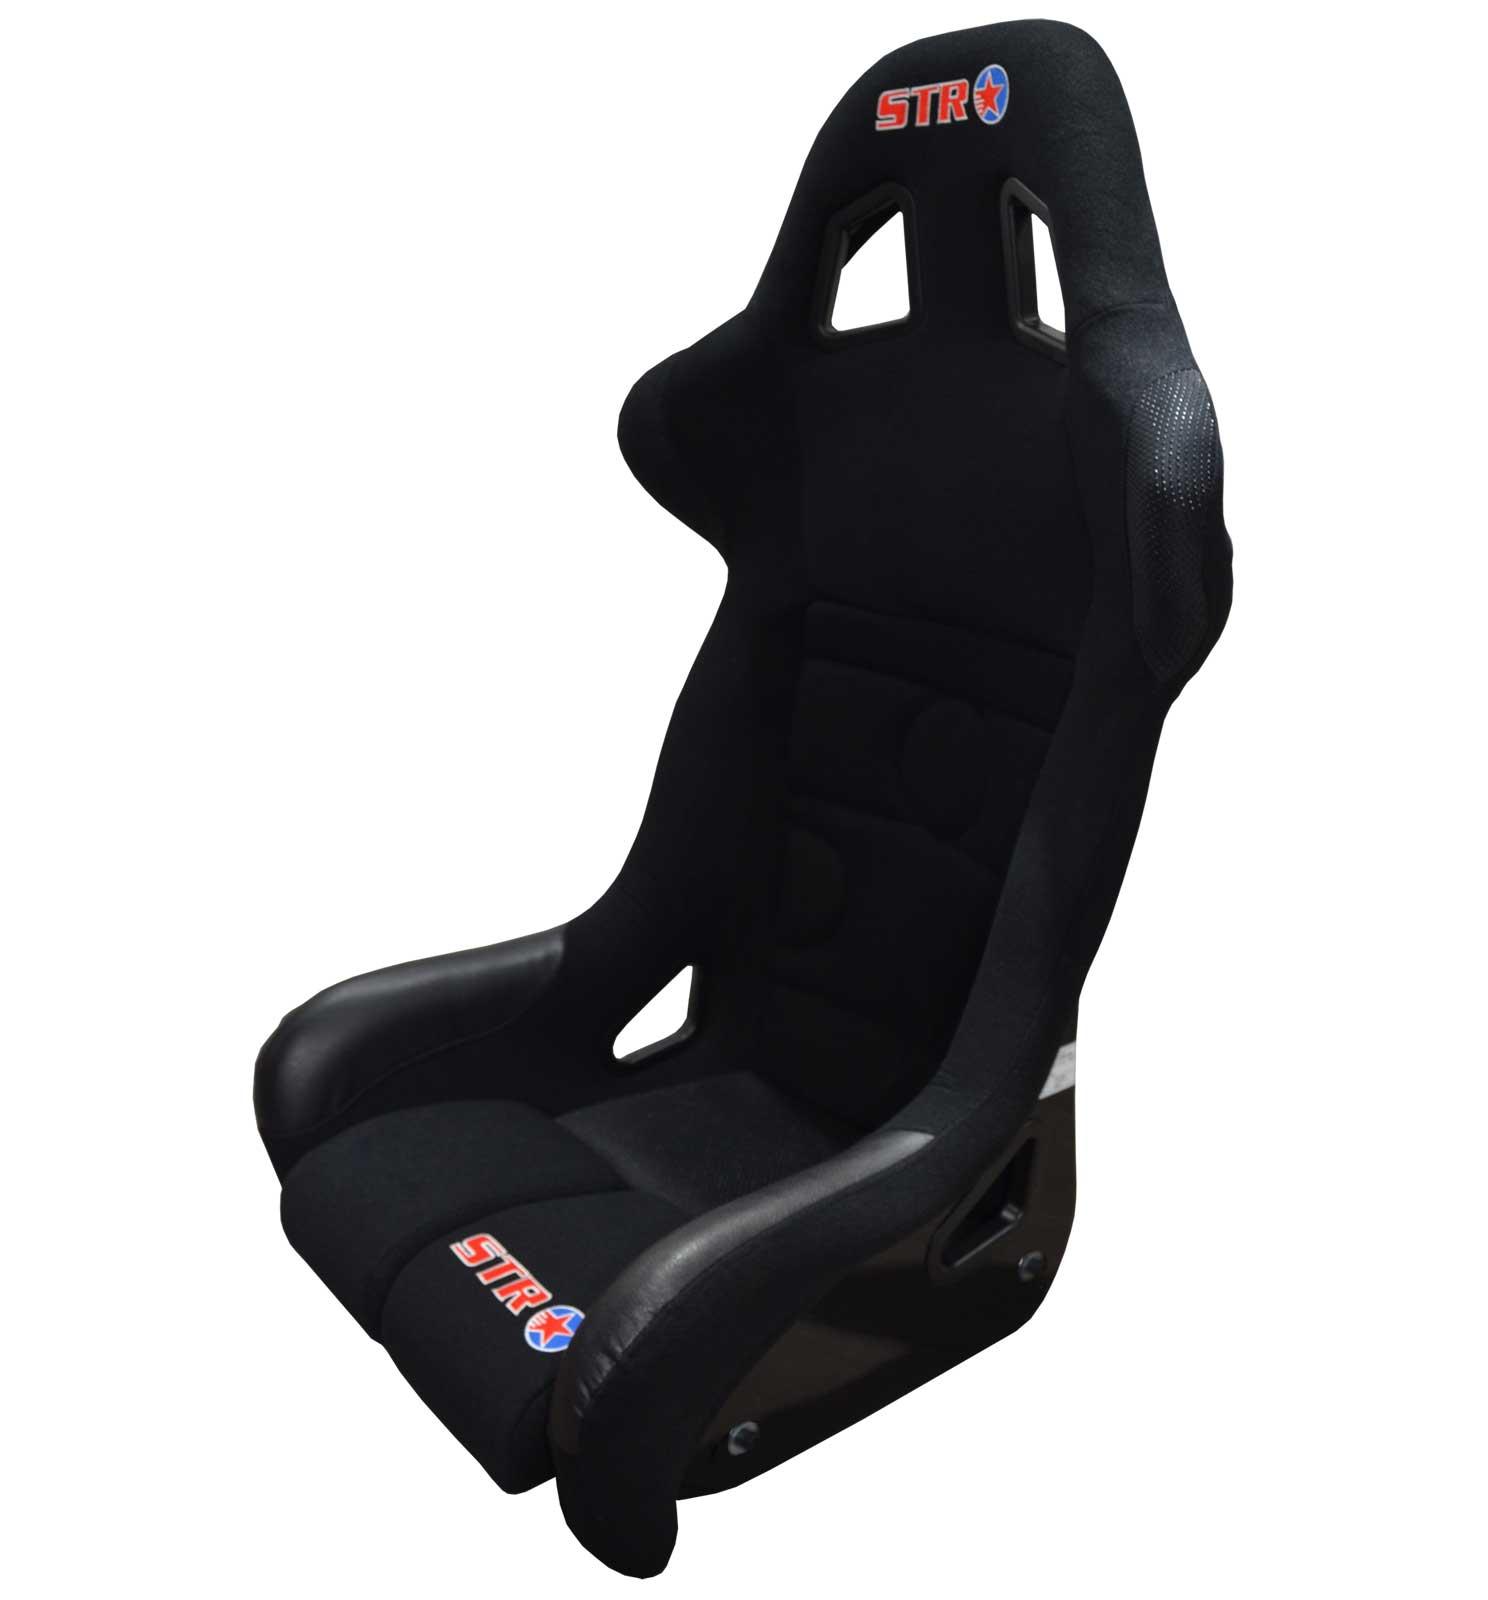 STR 'Angolo' FIA Approved Race/Rally/Bucket Seat  | Black - 2023